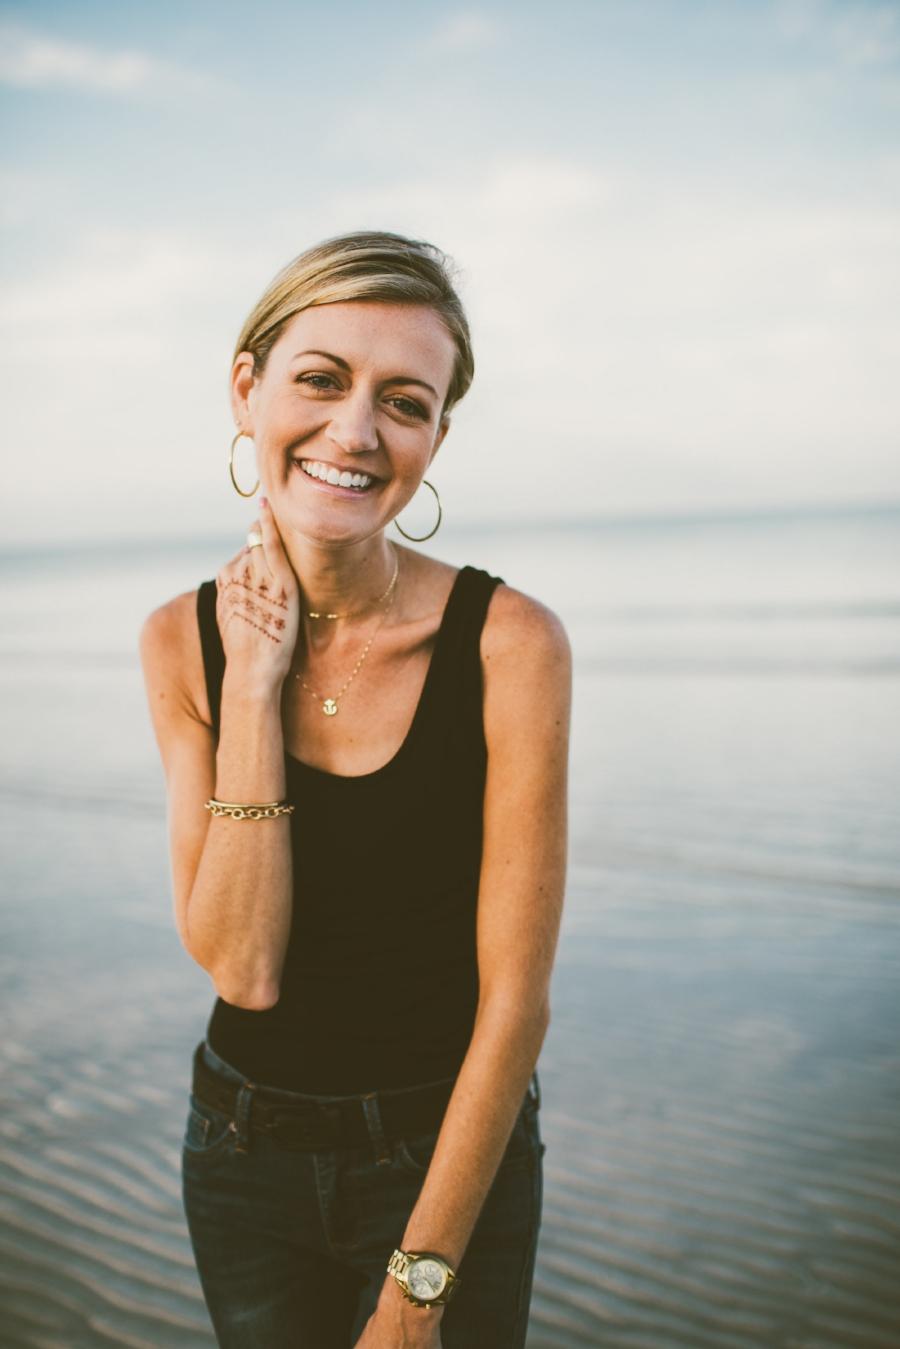 st-pete-beach-photographer